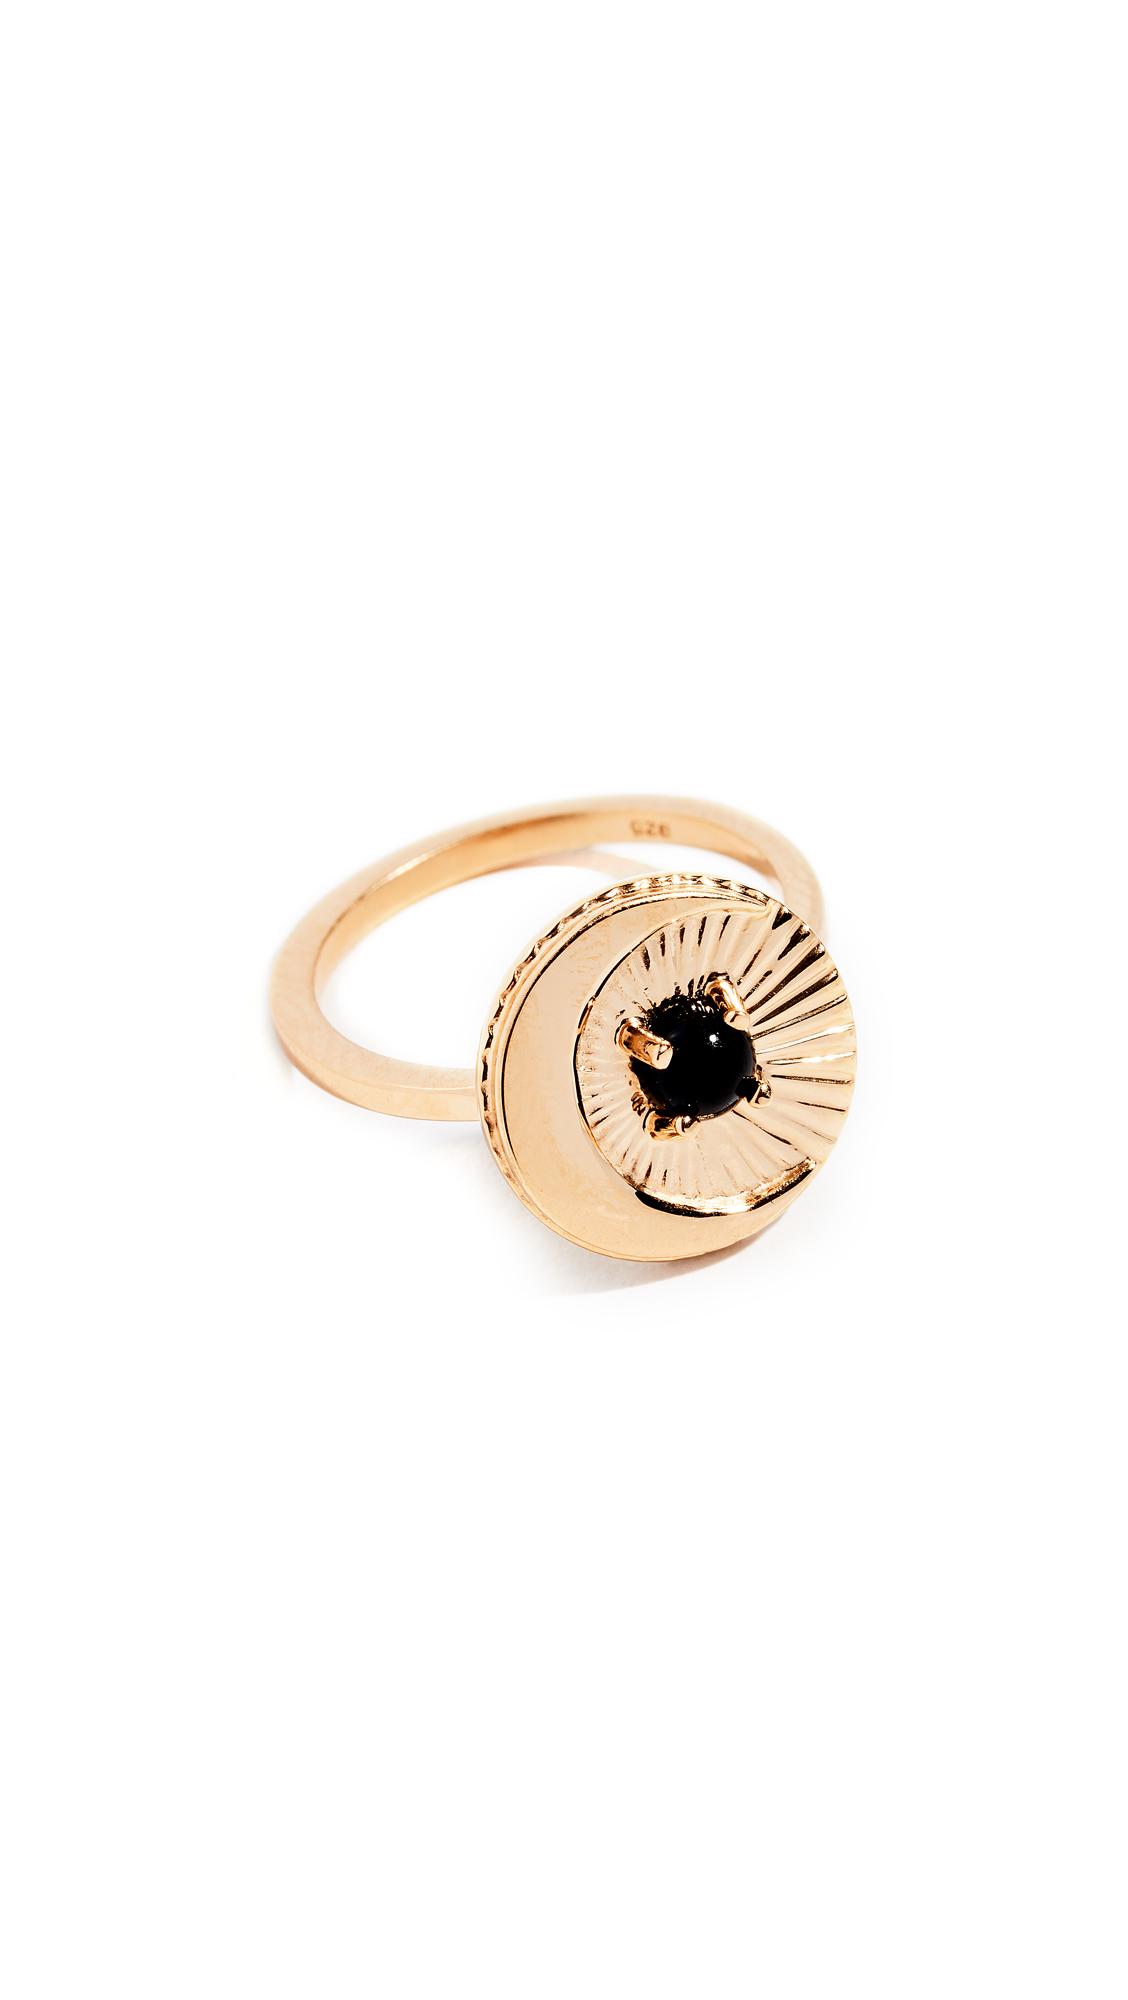 JENNIFER ZEUNER JEWELRY Amalfi Ring in Yellow Gold